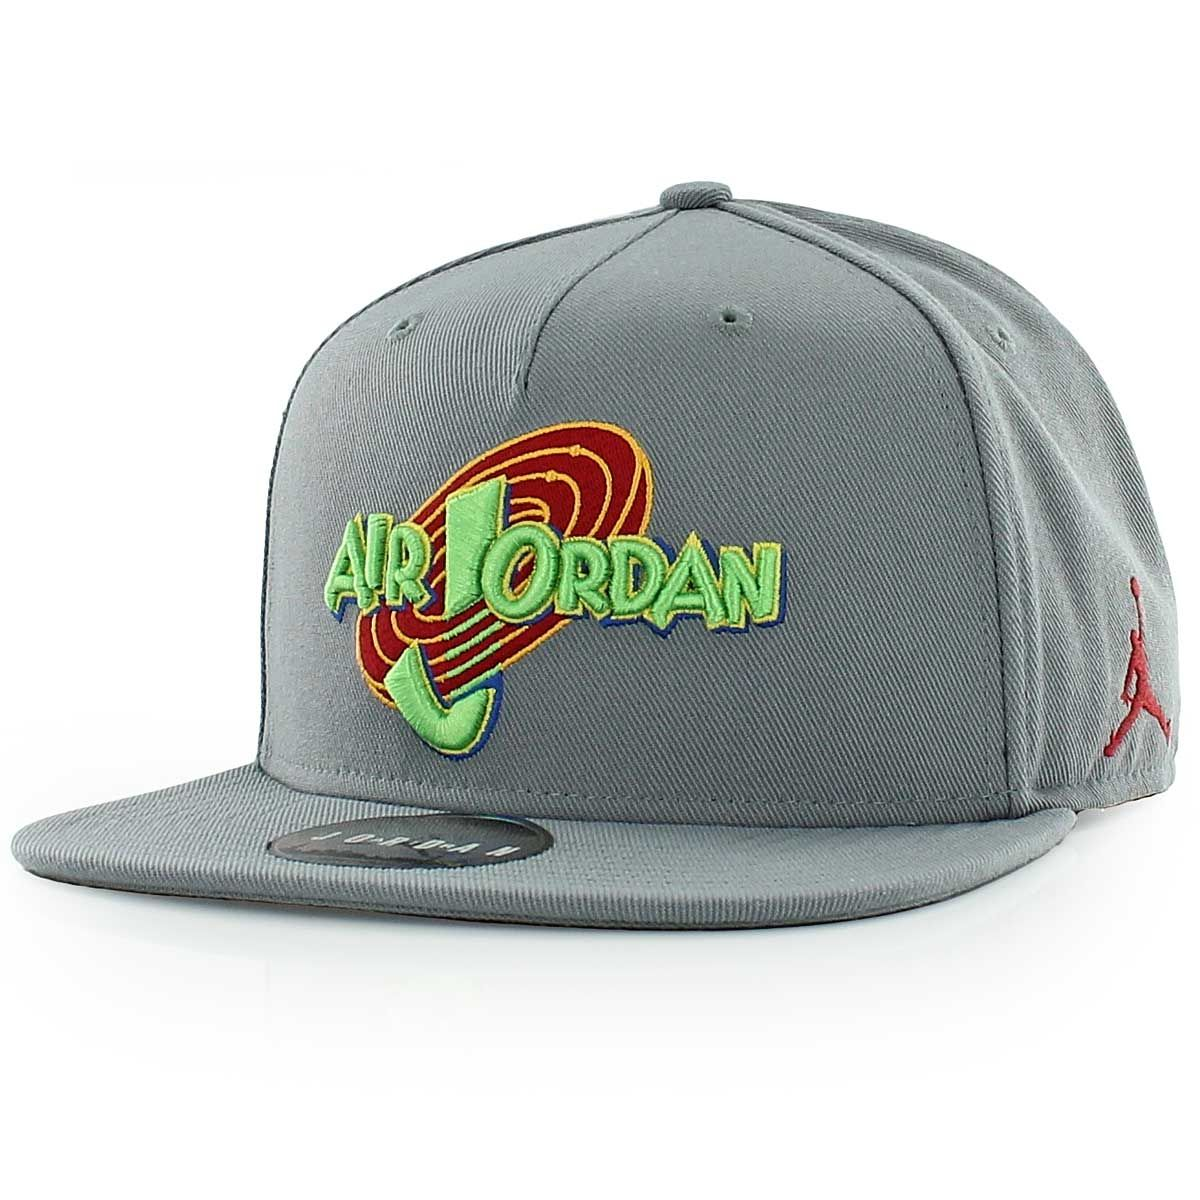 e84b30b77778c Boxing 1227  Ggg Gennady Golovkin Jumpan Air Jordan Hat Sold Out Canelo Big  Drama Show -  BUY IT NOW ONLY   120 on eBay!